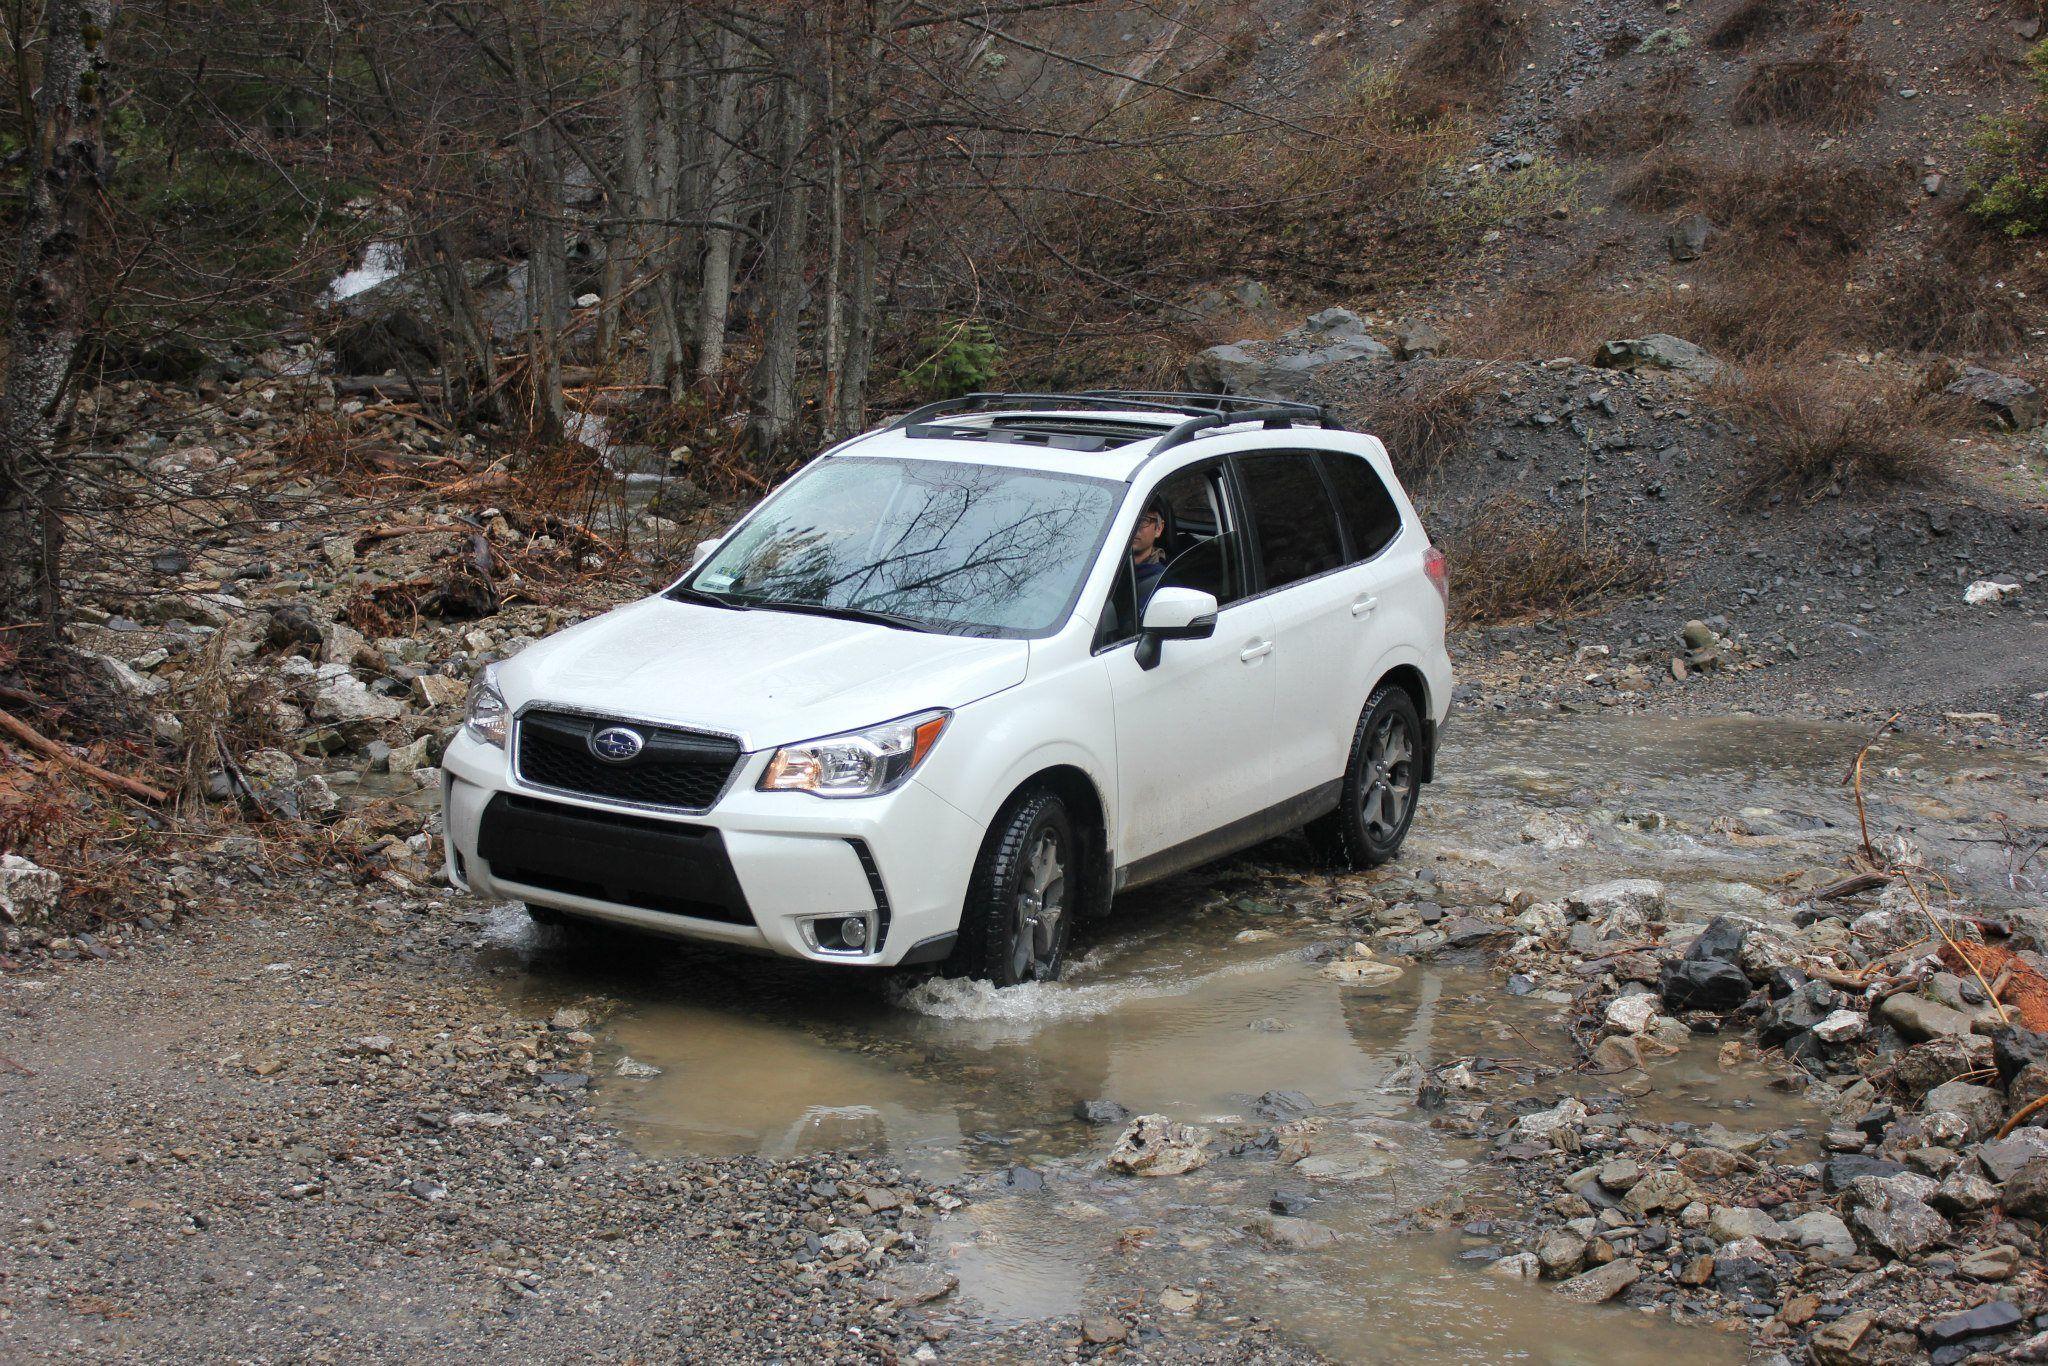 Subaru subaru forester owners forum